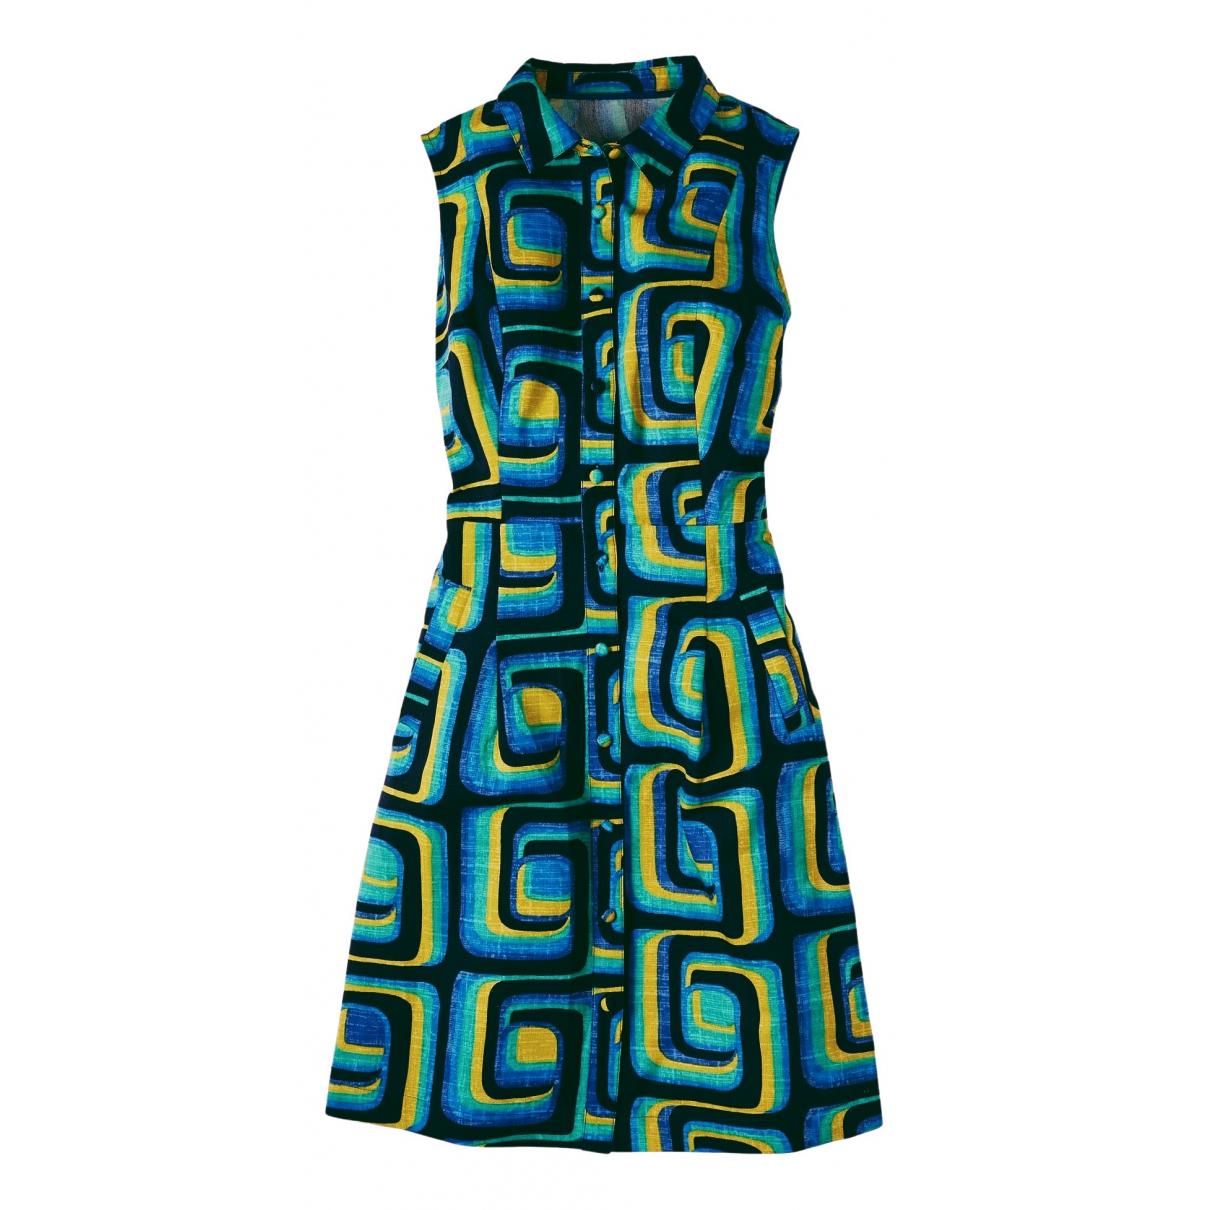 Boden \N Kleid in Baumwolle